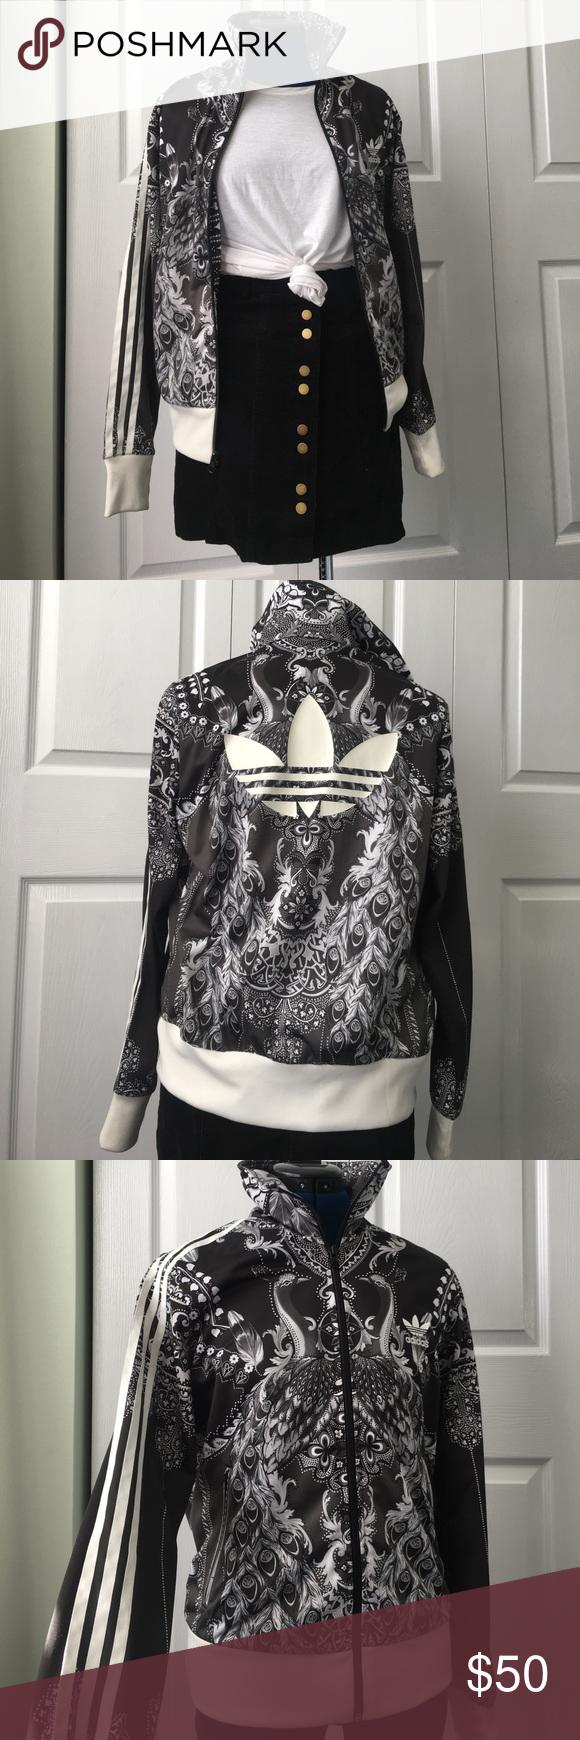 Rare Adidas Jacket Clothes Design Fashion Design Adidas Jacket [ 1740 x 580 Pixel ]